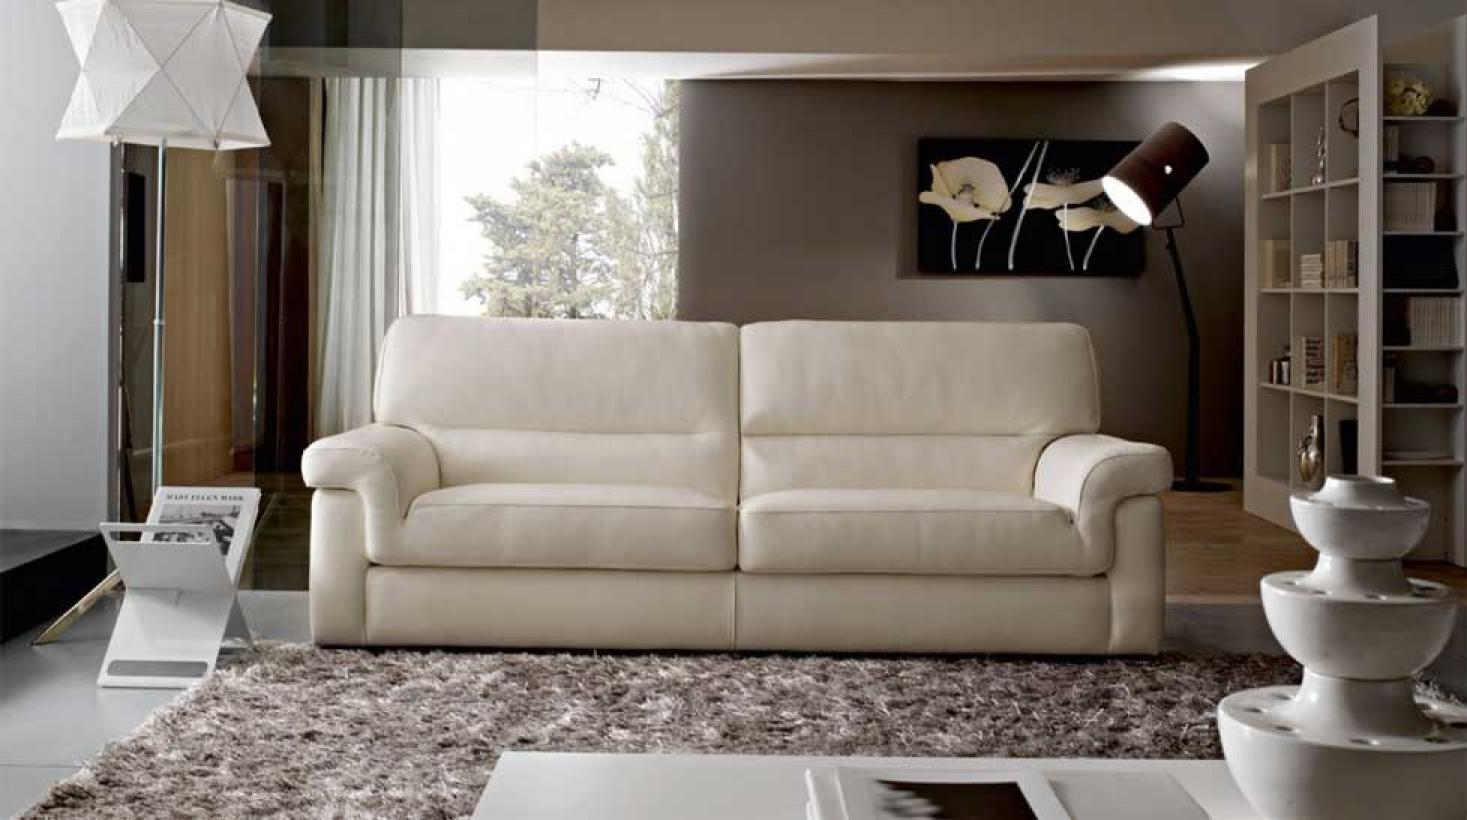 photos canap italien promo. Black Bedroom Furniture Sets. Home Design Ideas